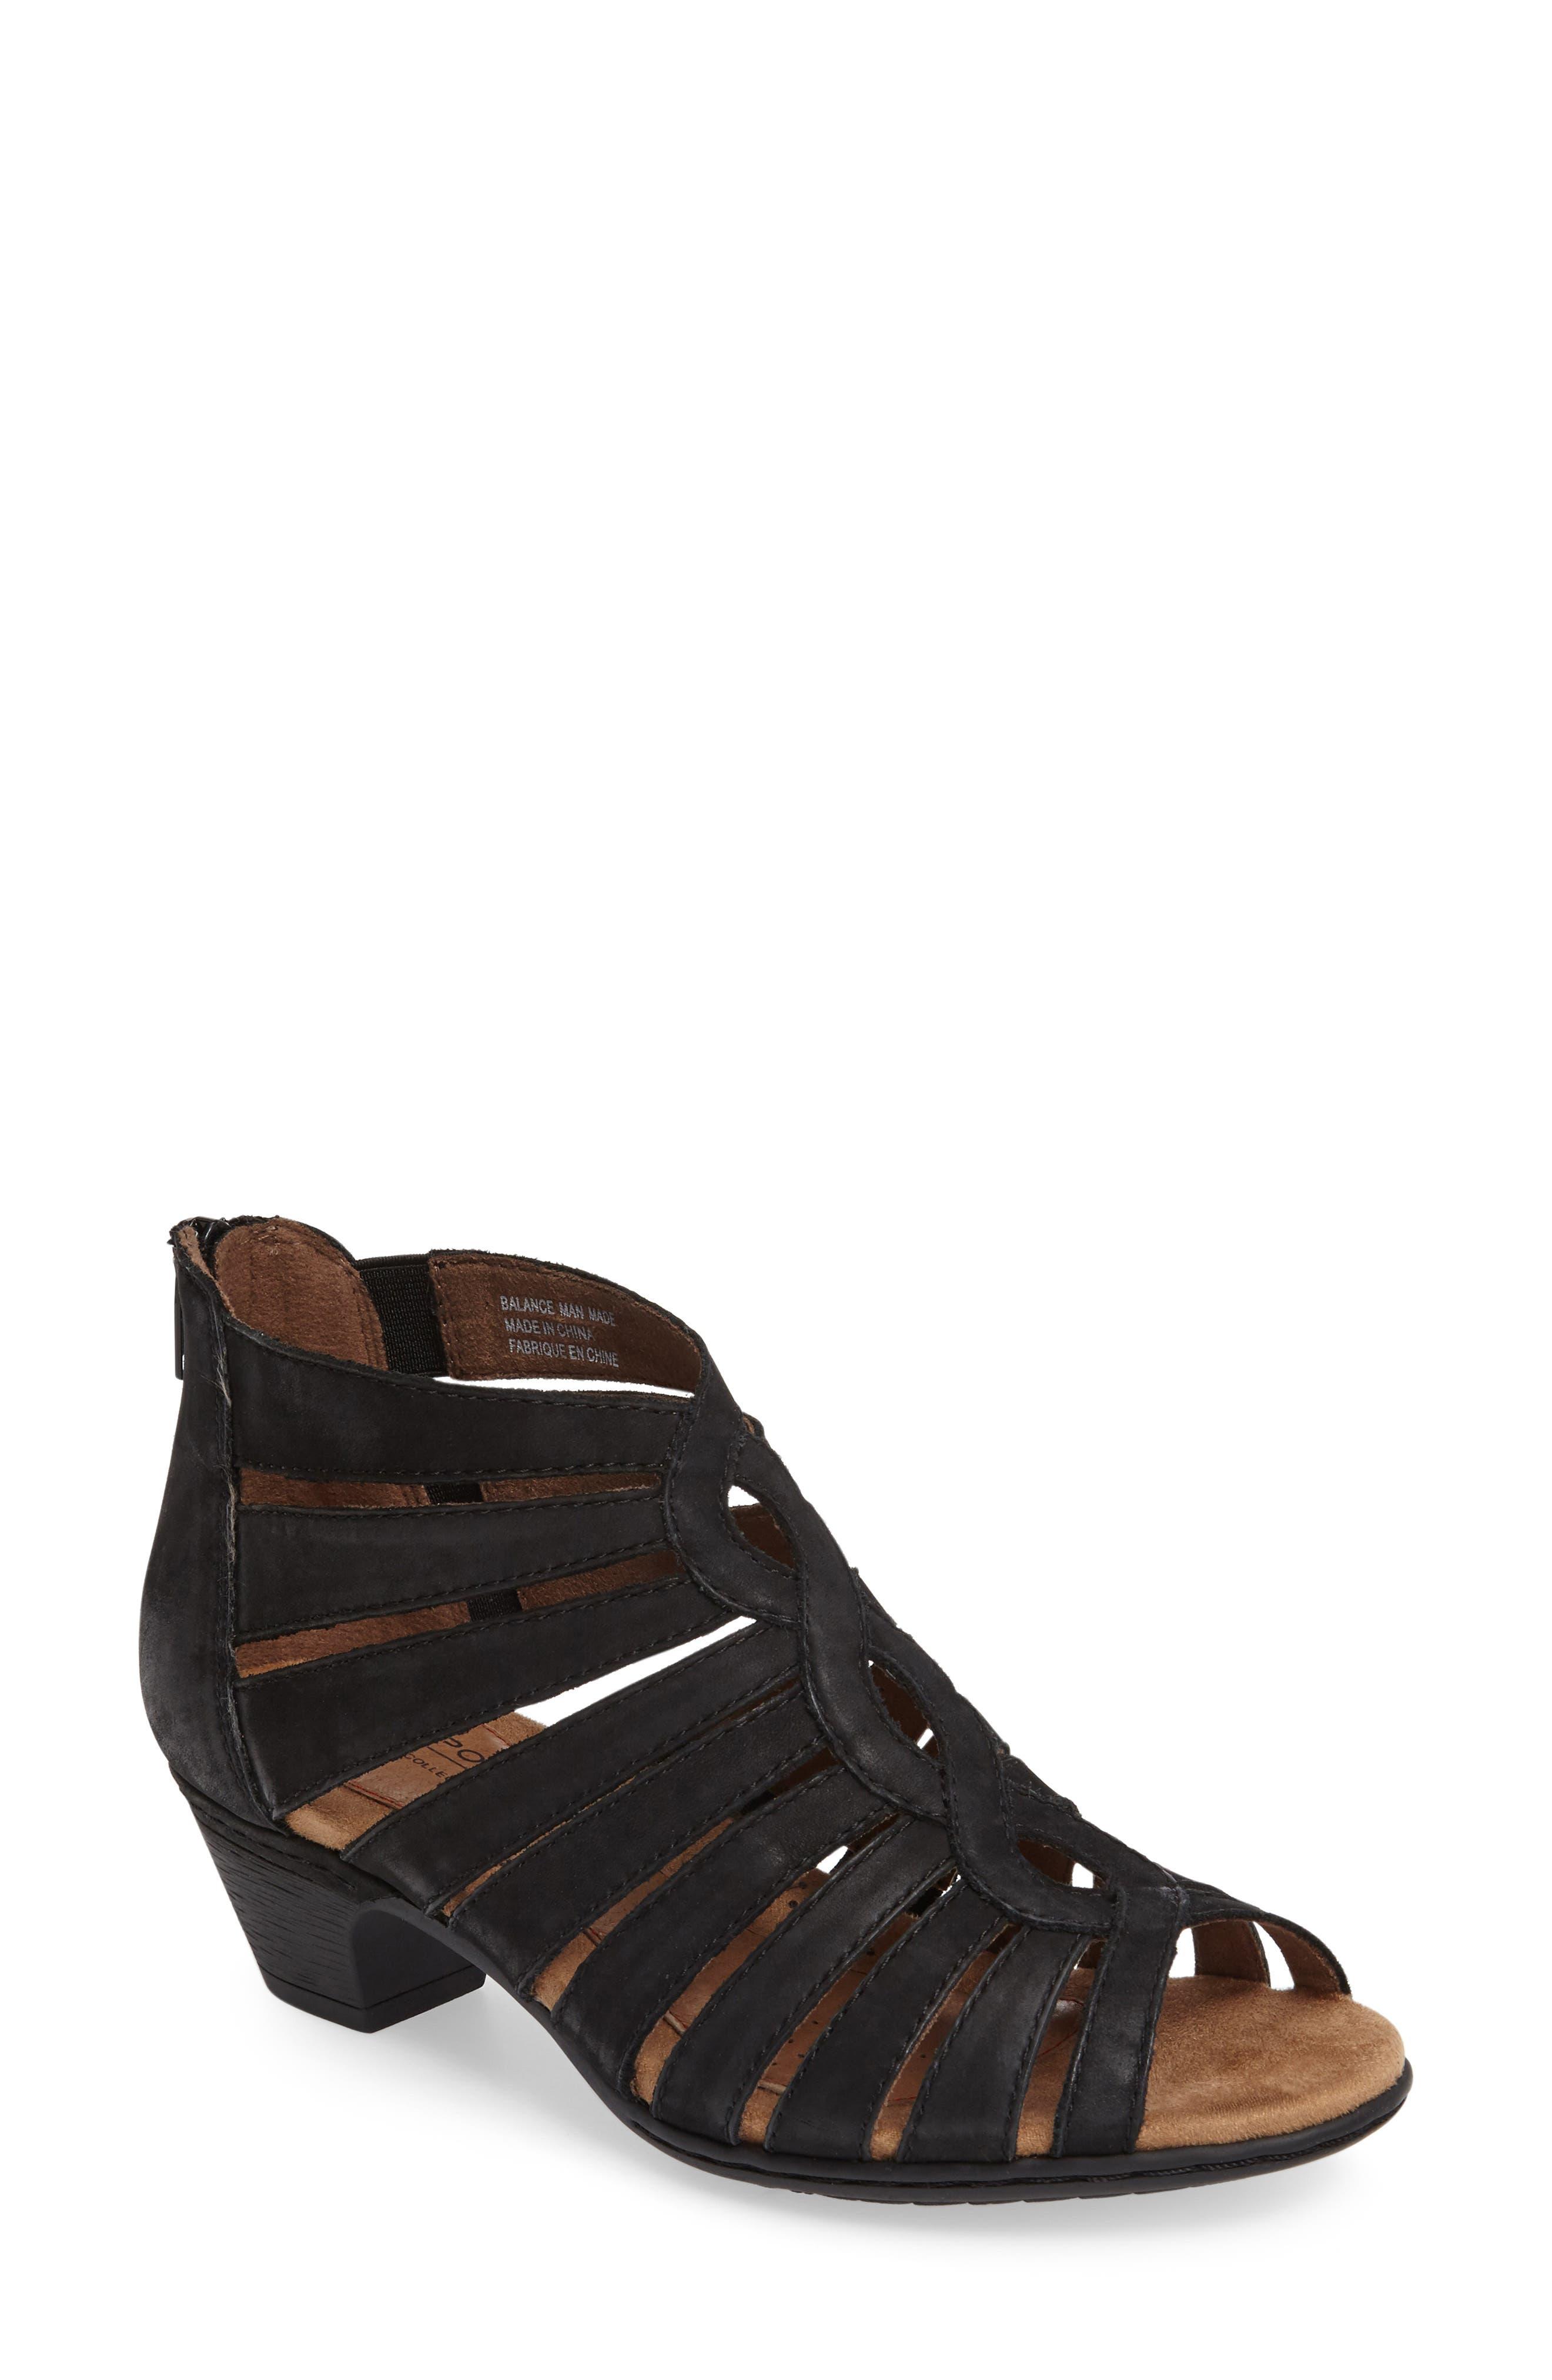 Abbott Caged Sandal,                         Main,                         color, BLACK LEATHER